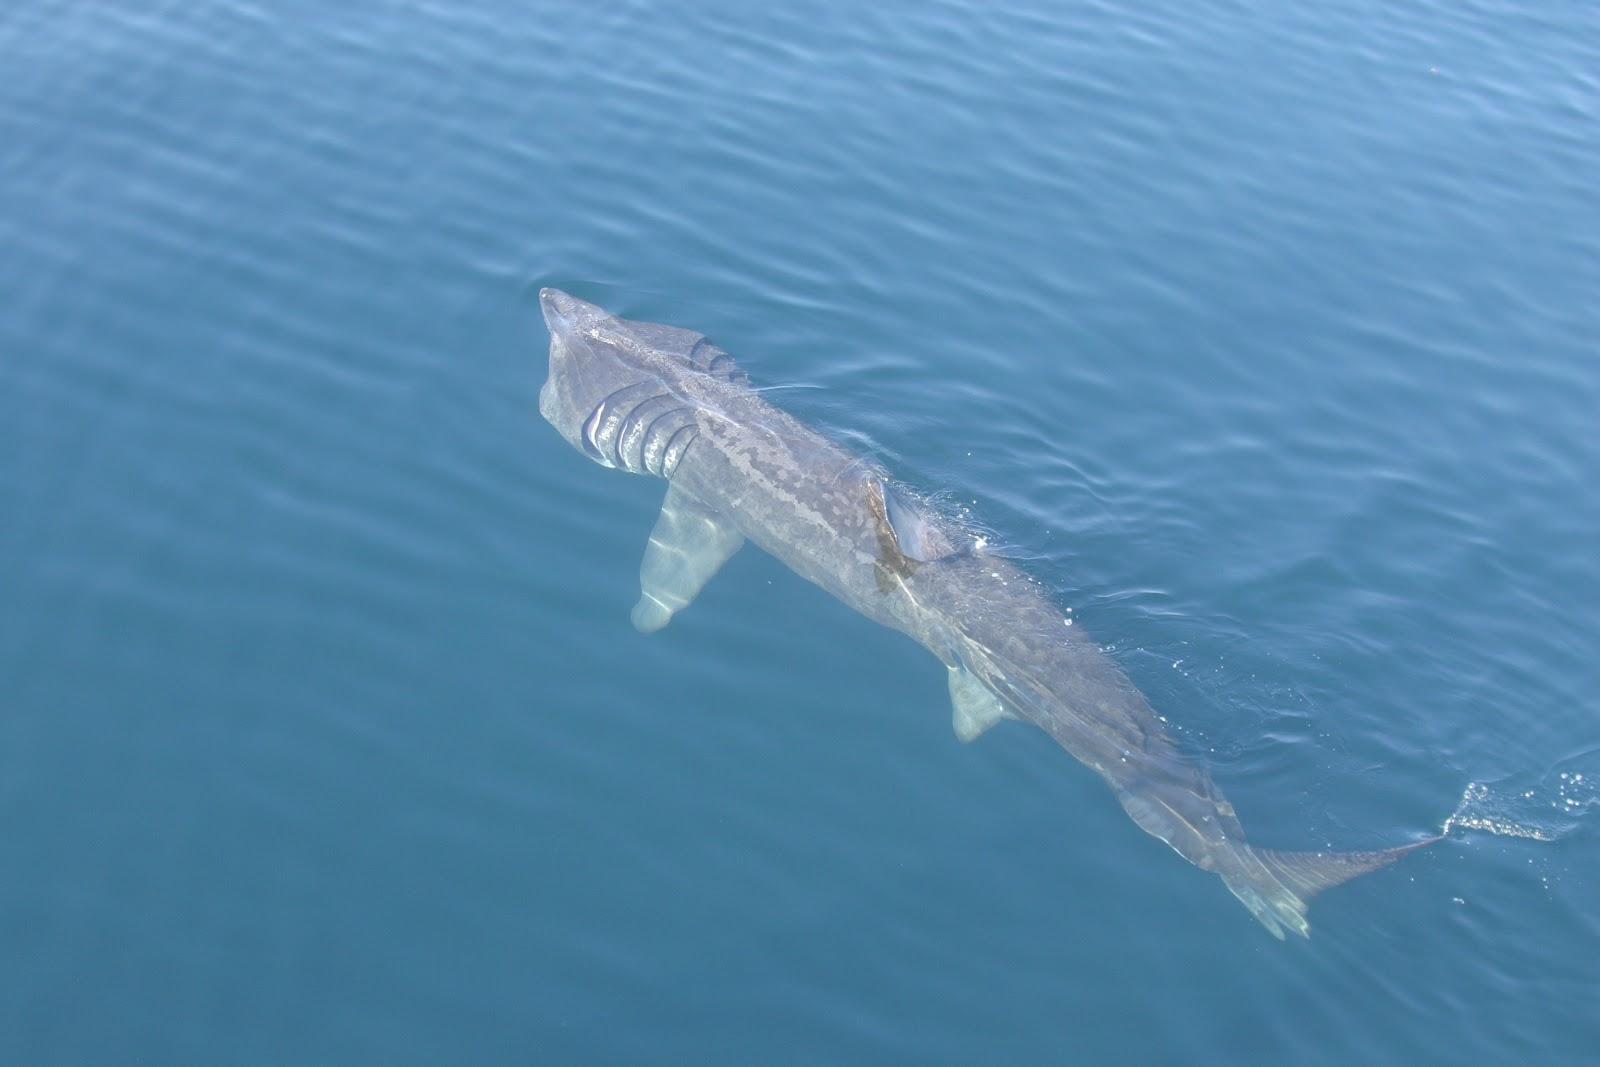 Basking Shark - Fishes World - HD Images & Free Photos